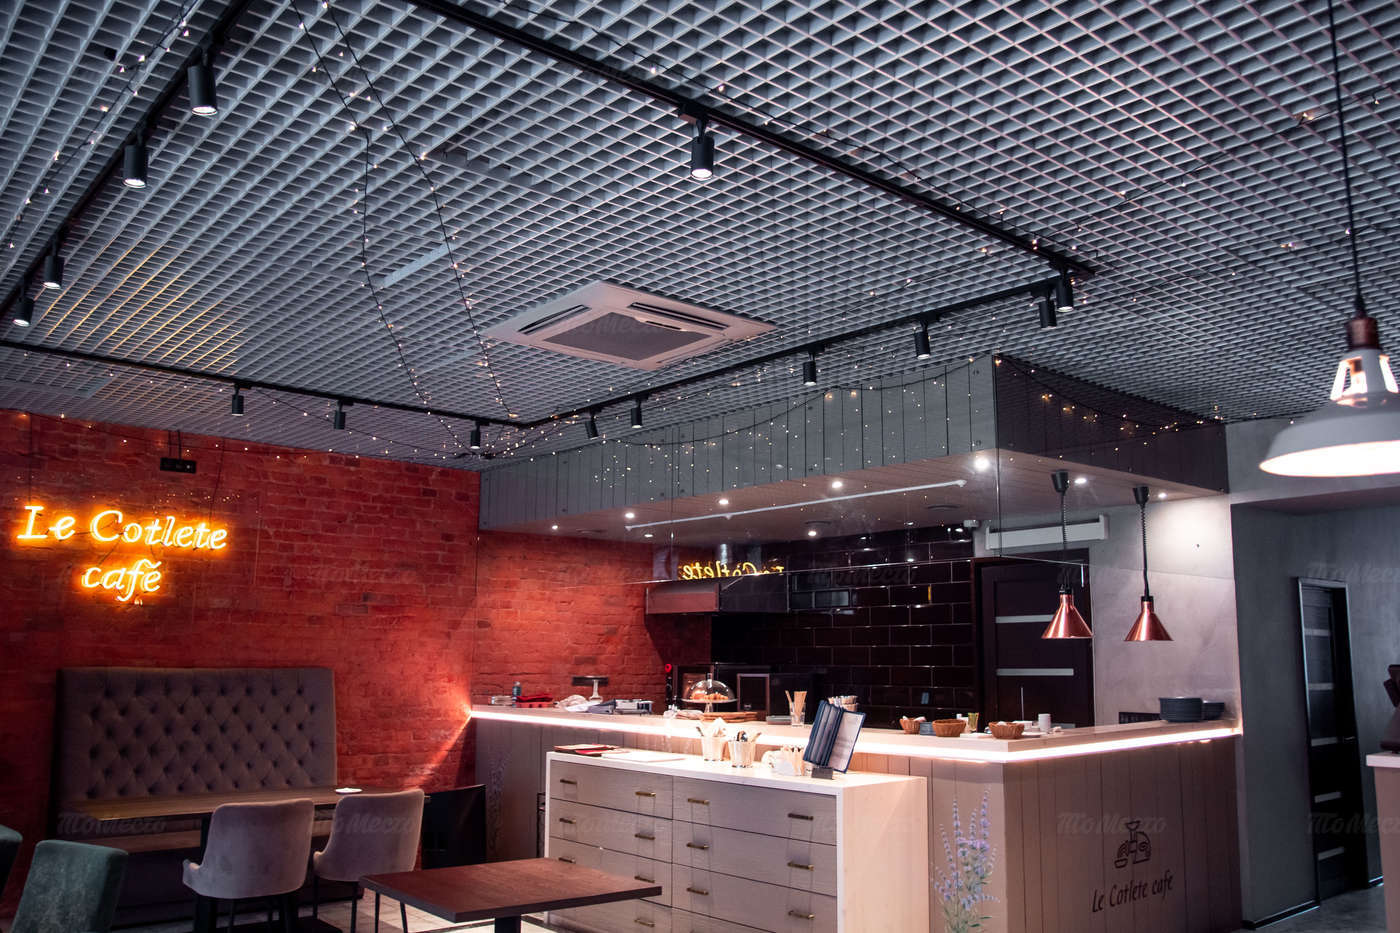 Кафе Le Cotlete Cafe на Чайковского фото 6